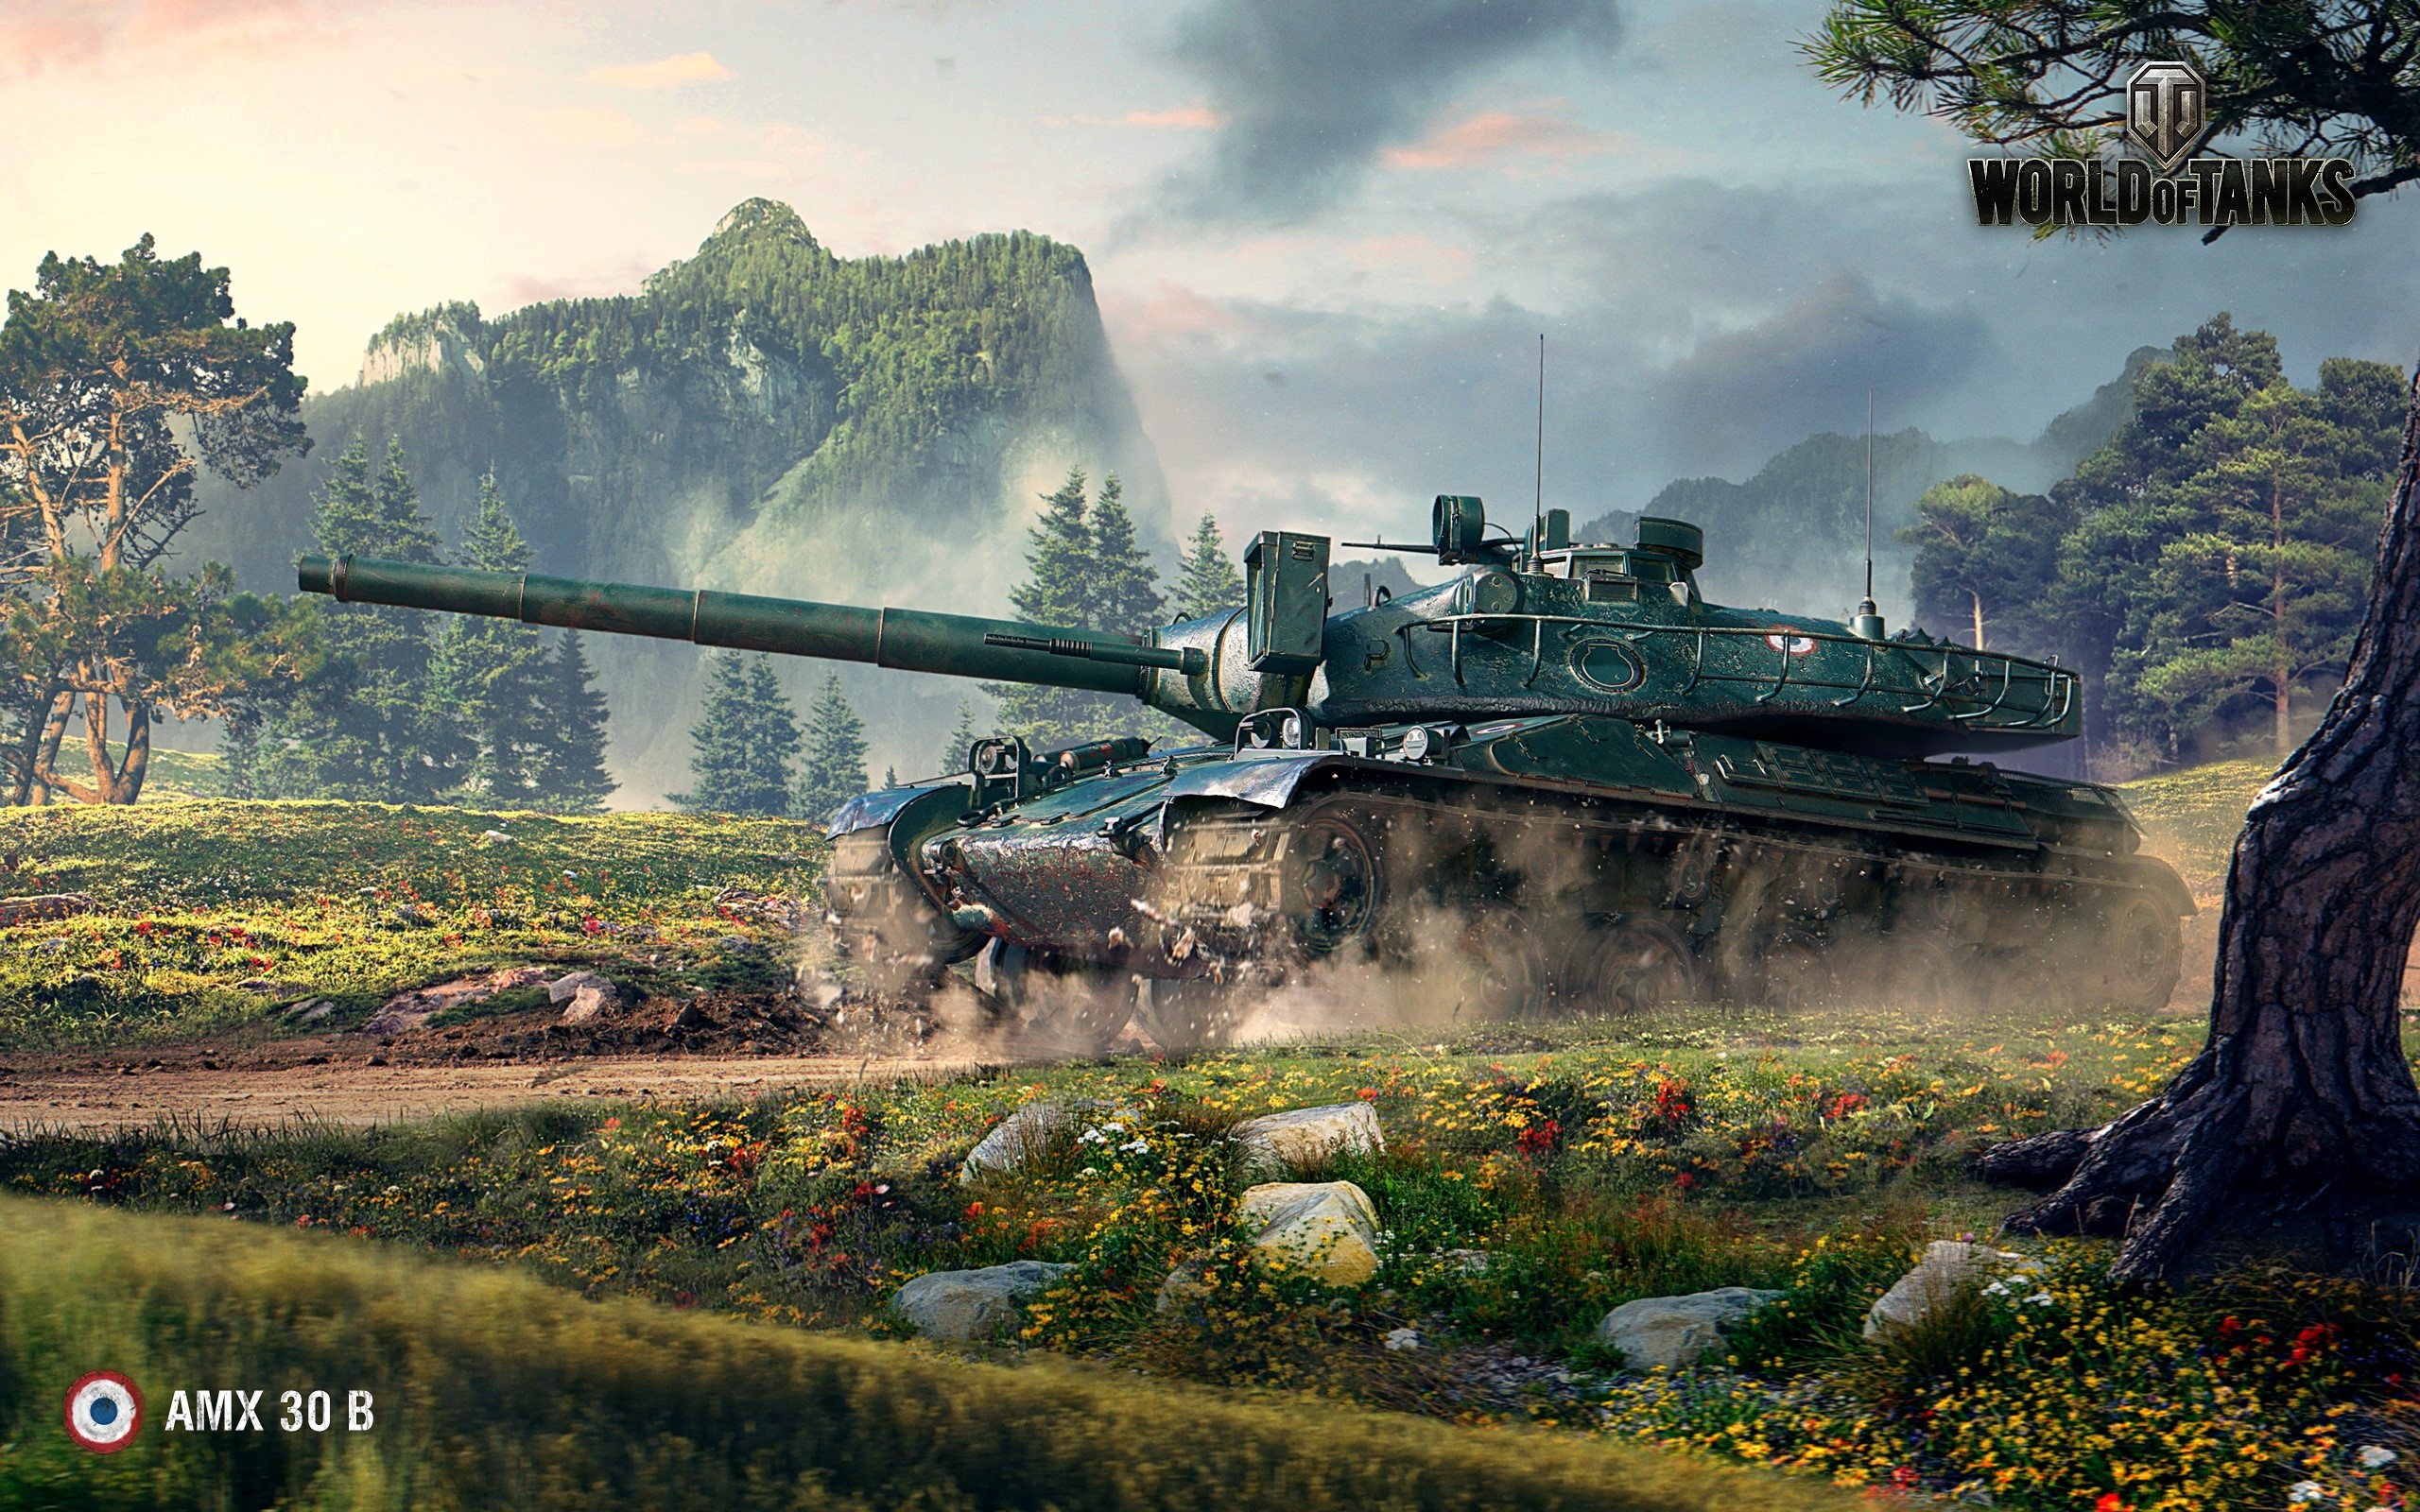 Wallpaper AMX 30 World of tanks